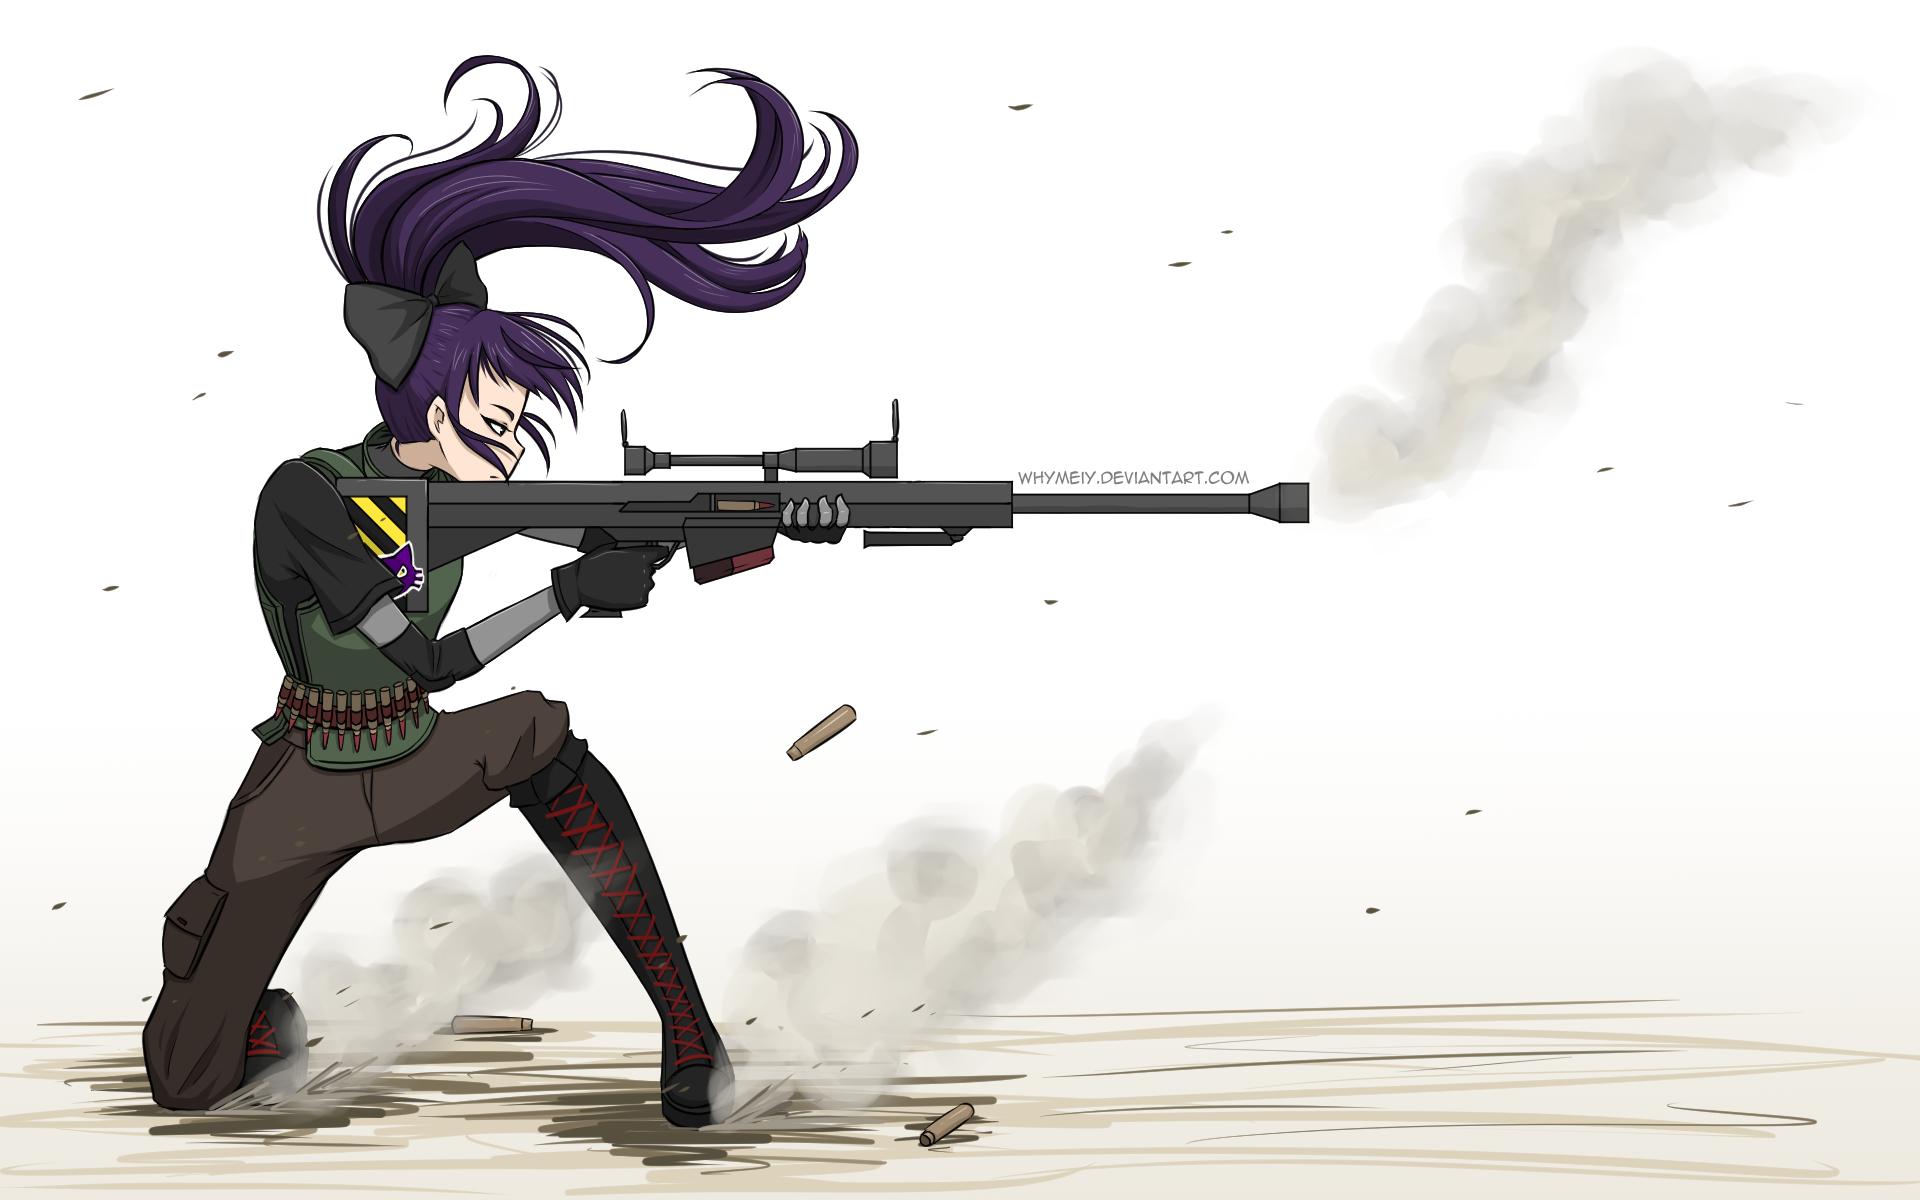 Sniper girl by whymeiy on deviantart - Anime sniper girl ...